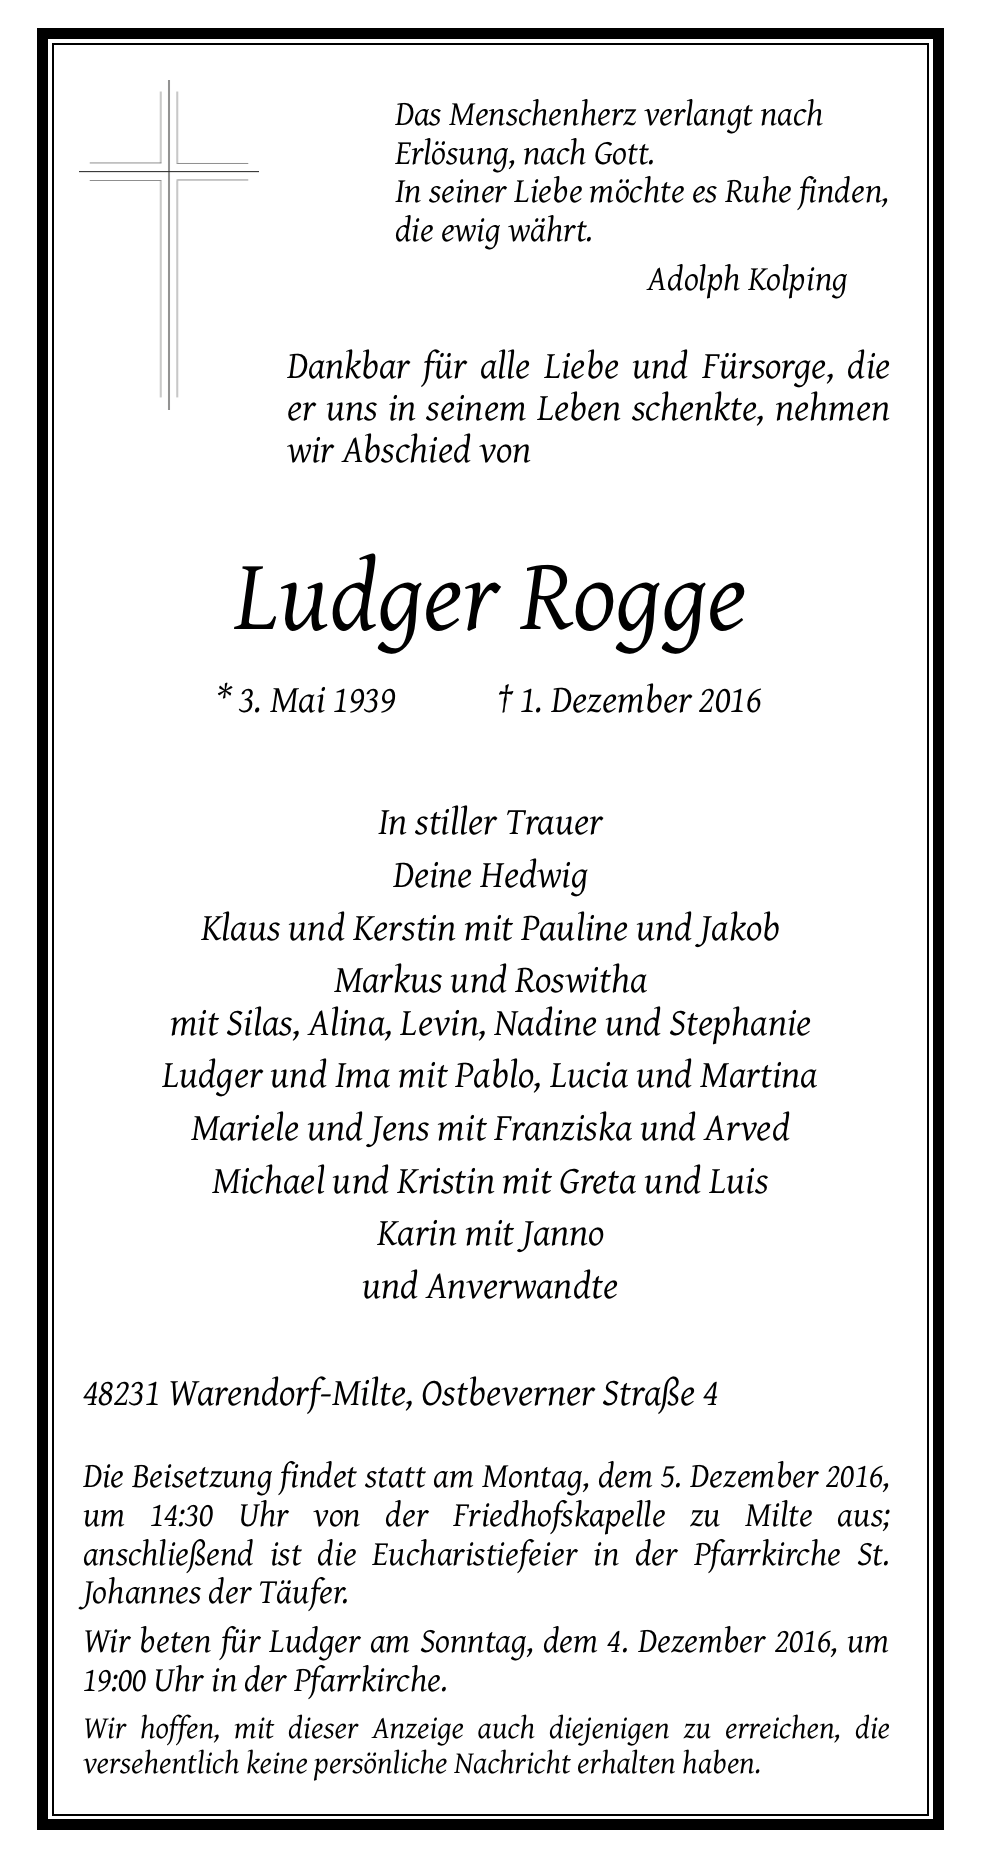 rogge-ludger